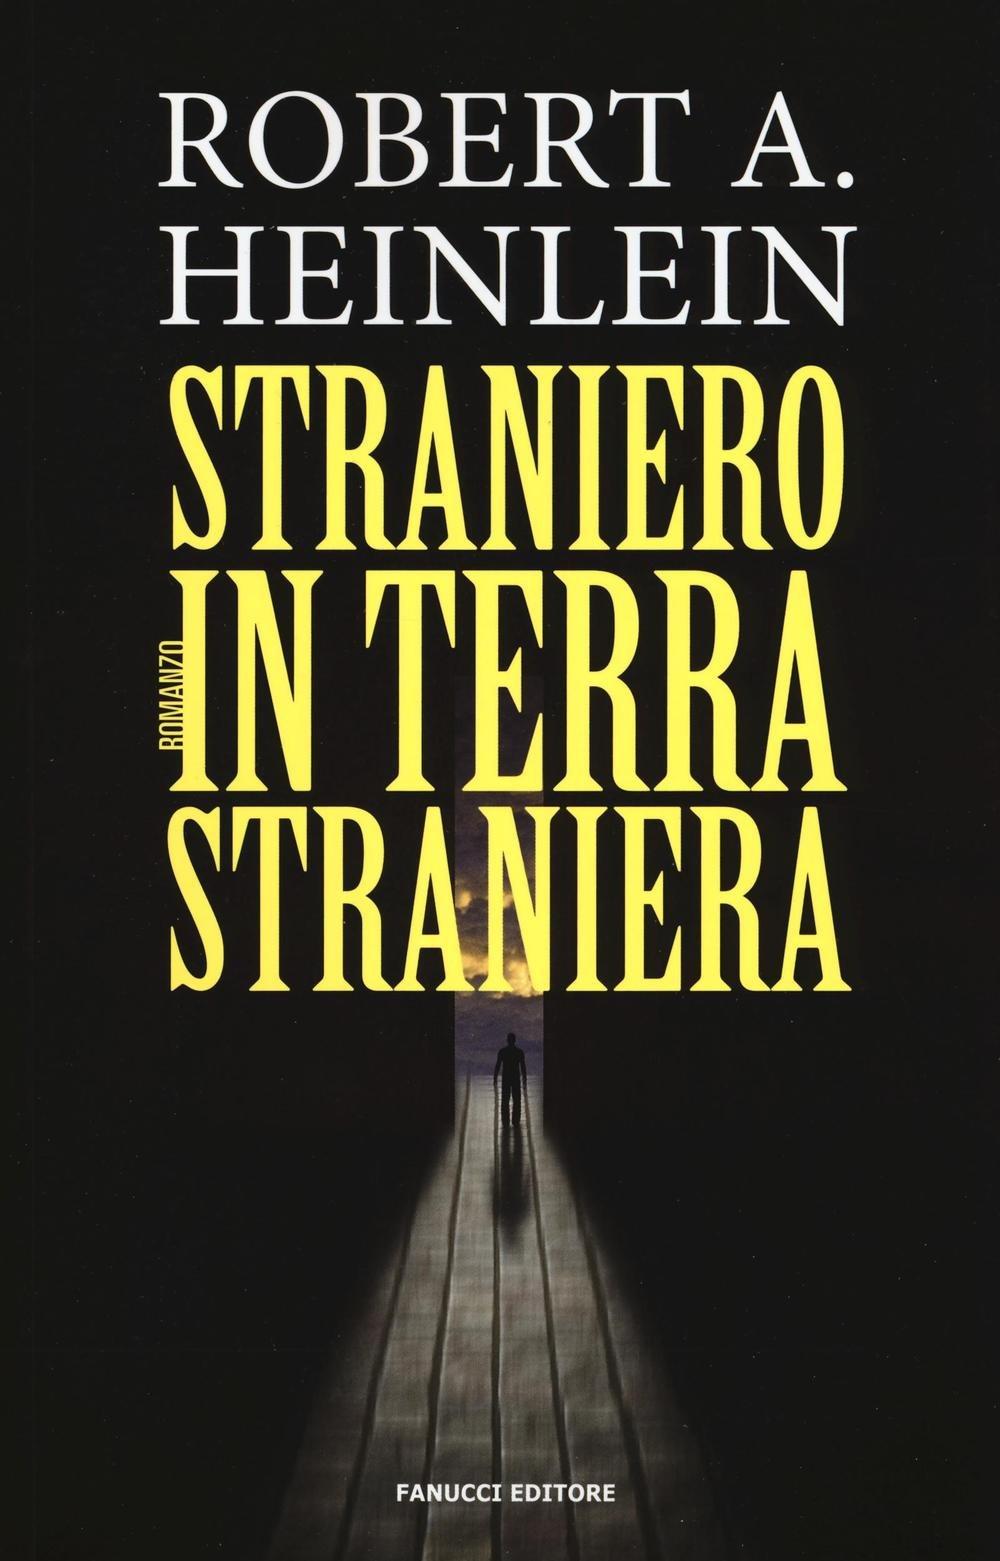 Robert A. Heinlein – Straniero in terra straniera